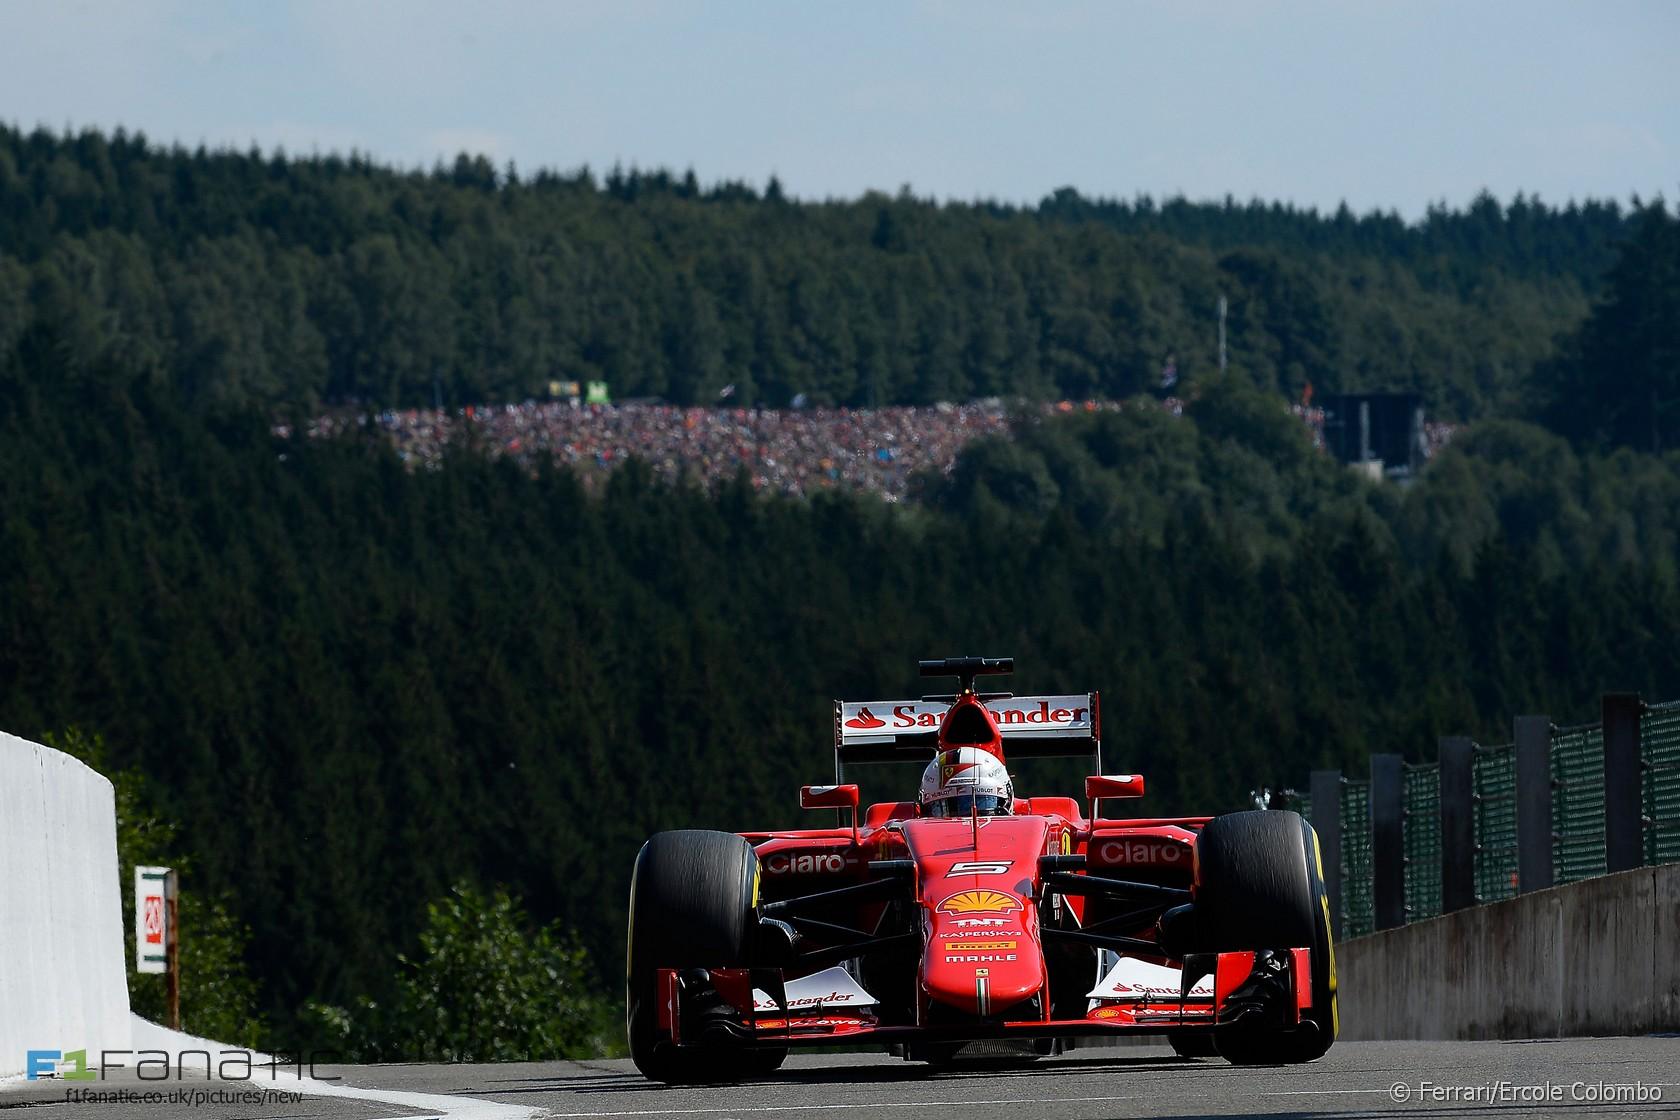 Sebastian Vettel, Ferrari, Spa-Francorchamps, 2015